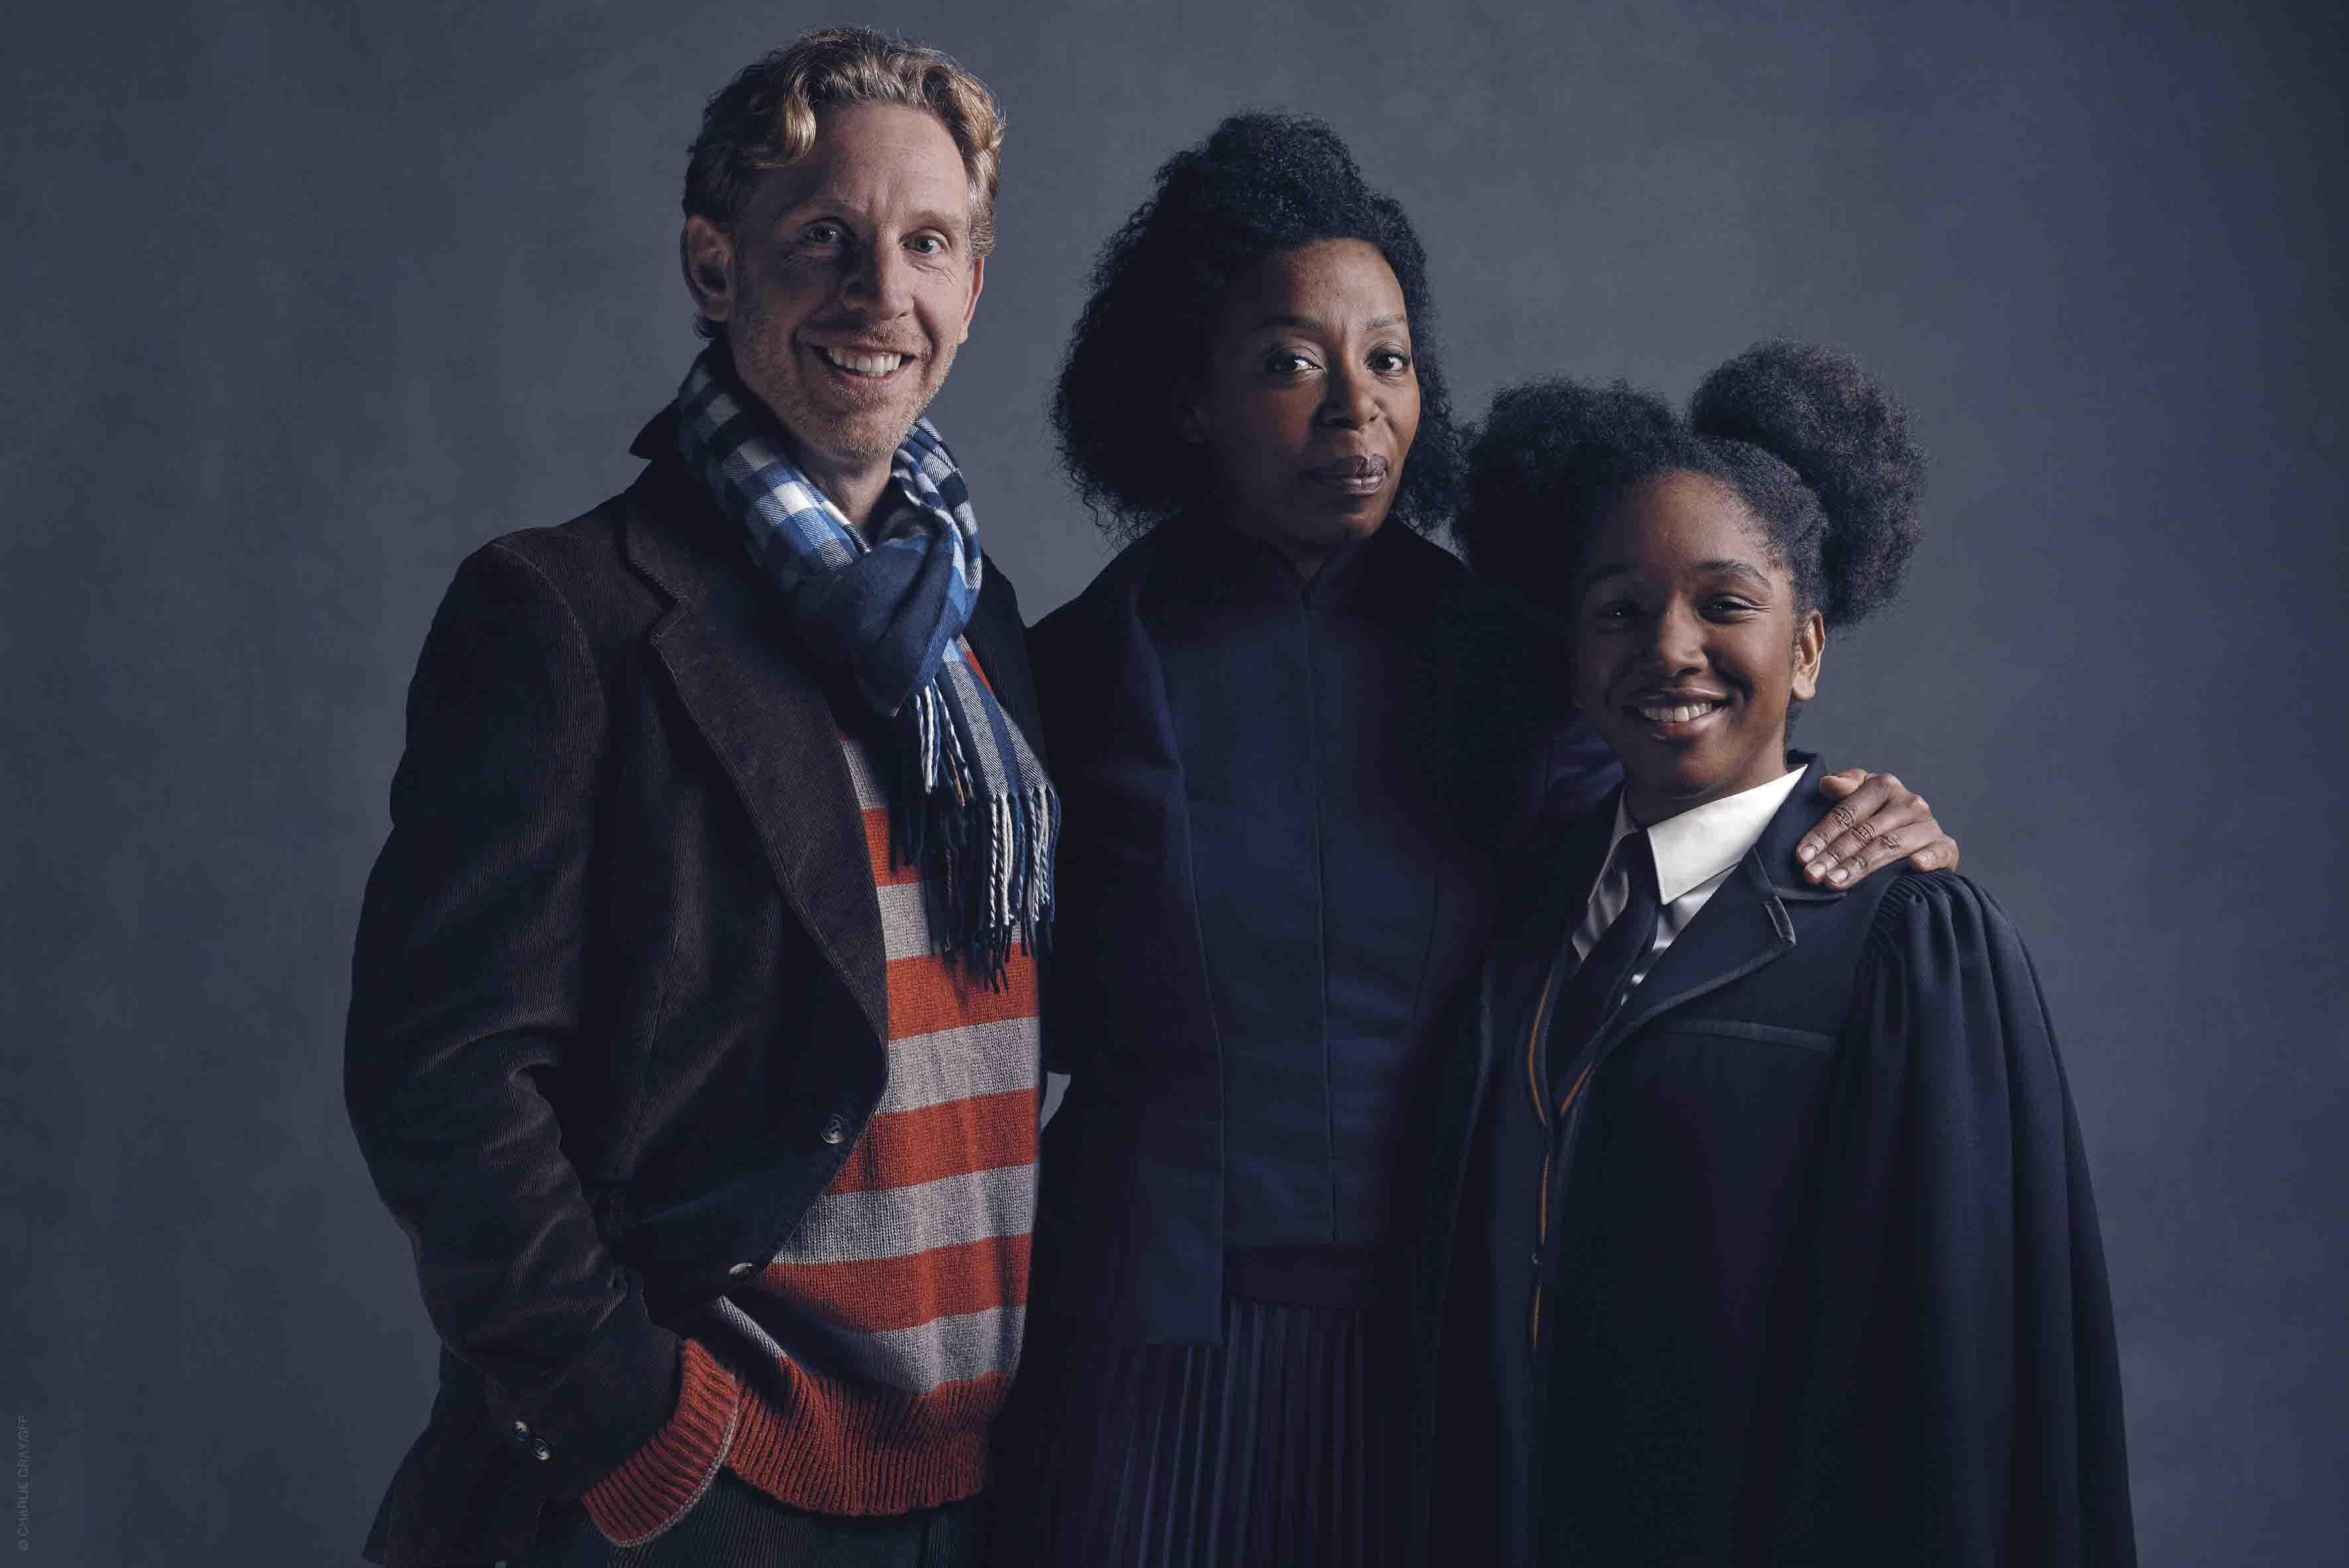 Ron-Weasley-Paul-Thornley-Hermione-Granger-Noma-Dumezweni-Rose-Granger-Weasley